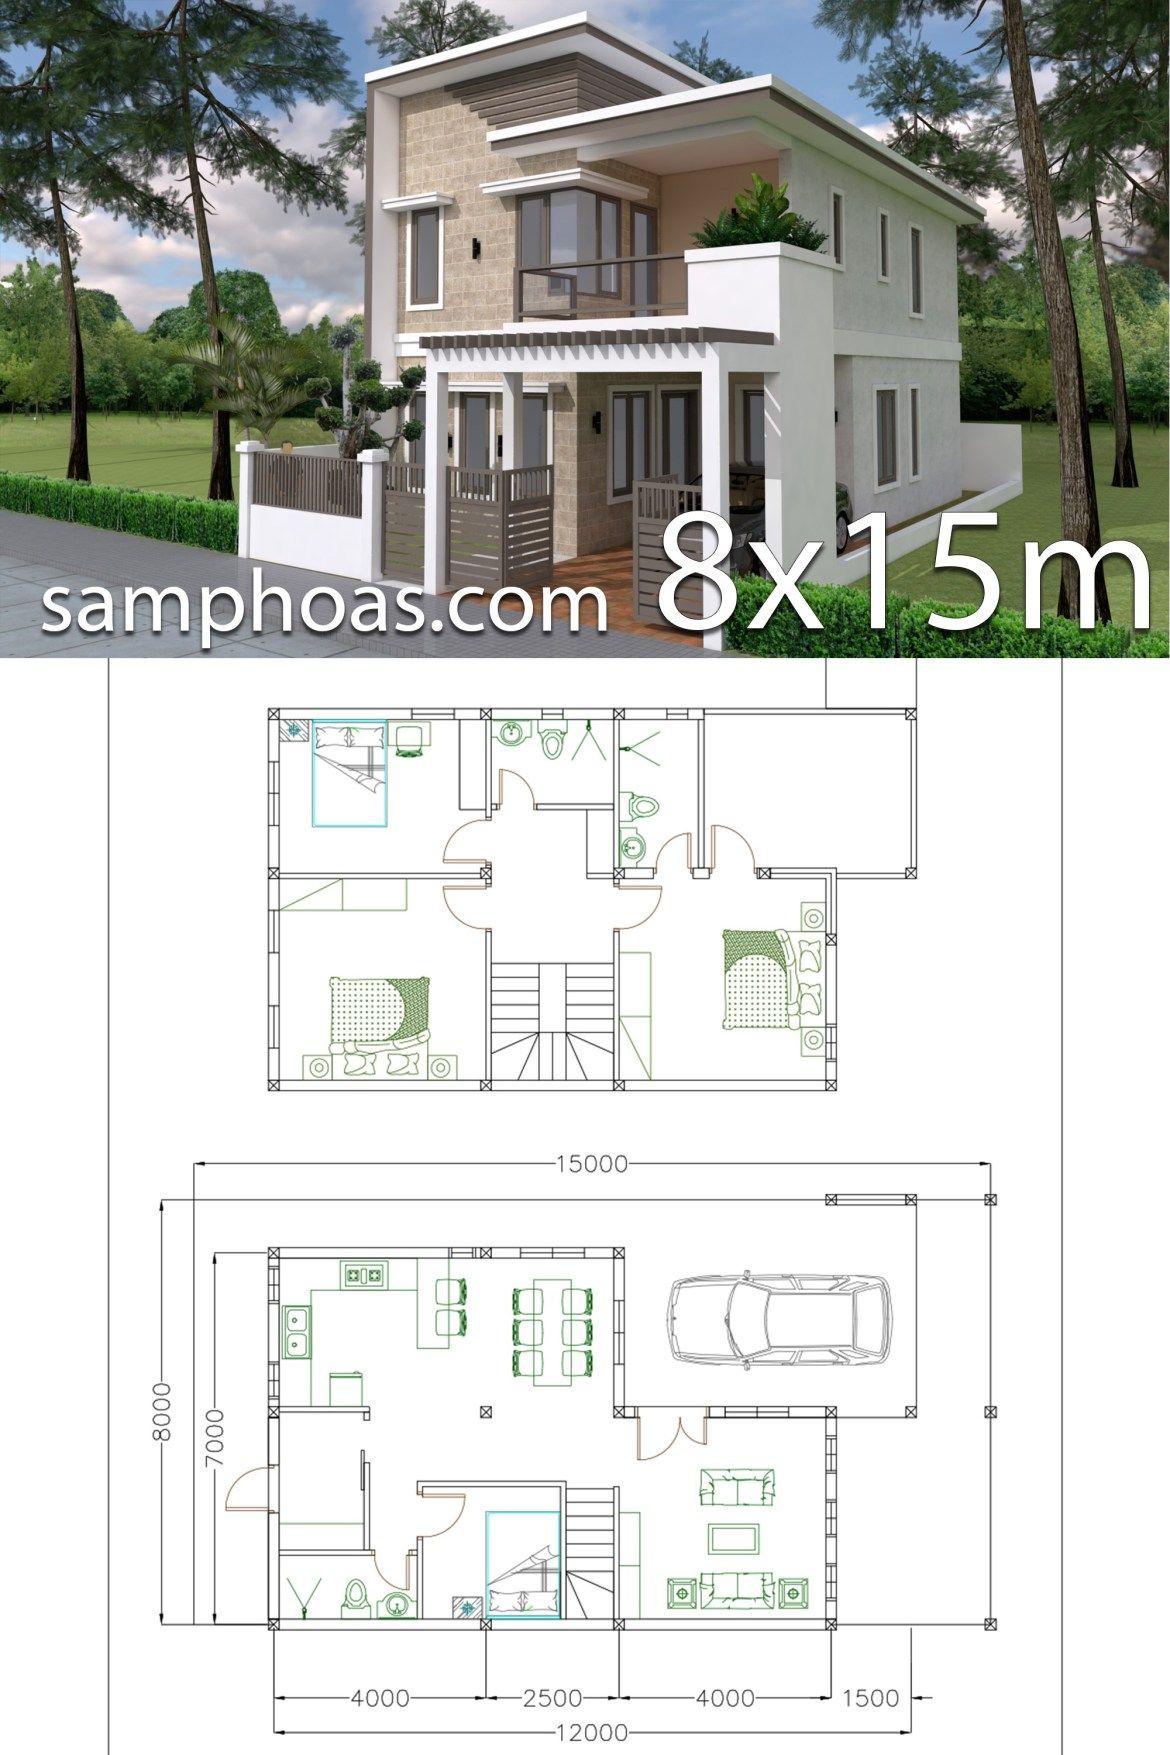 Home Design Plan 7x12m With 4 Bedrooms Plot 8x15 Samphoas Plansearch Home Design Plan House Construction Plan Model House Plan